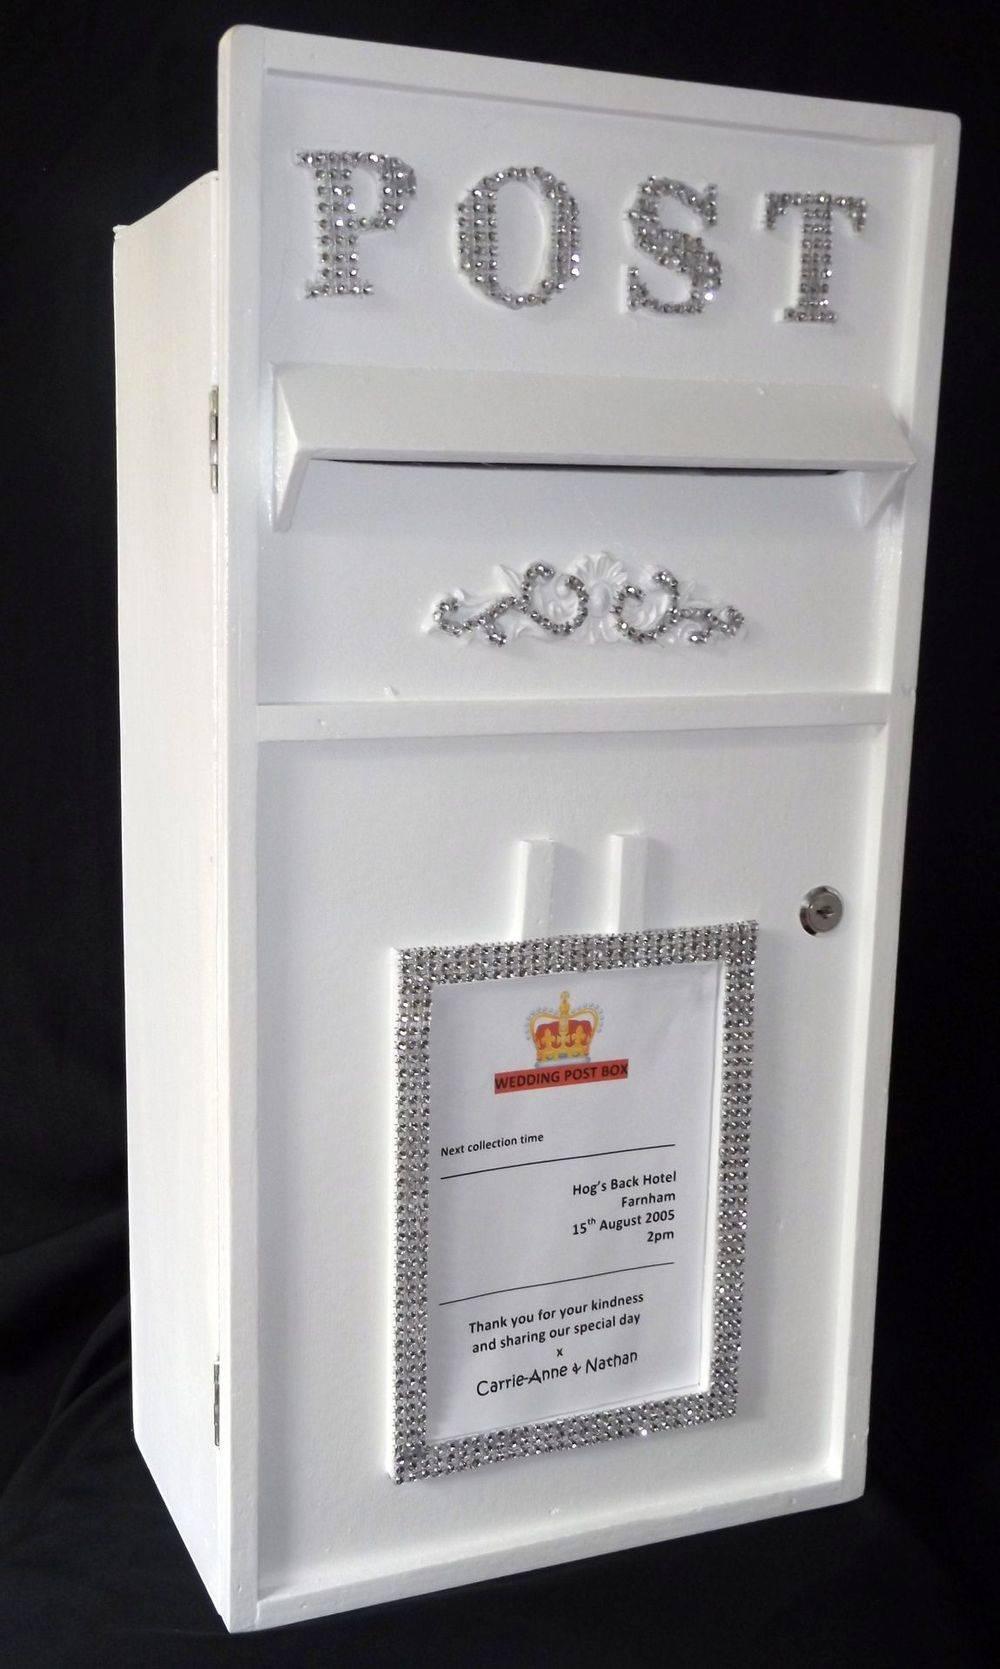 White Wood Wedding Post Box Hire, Surrey, Hampshire